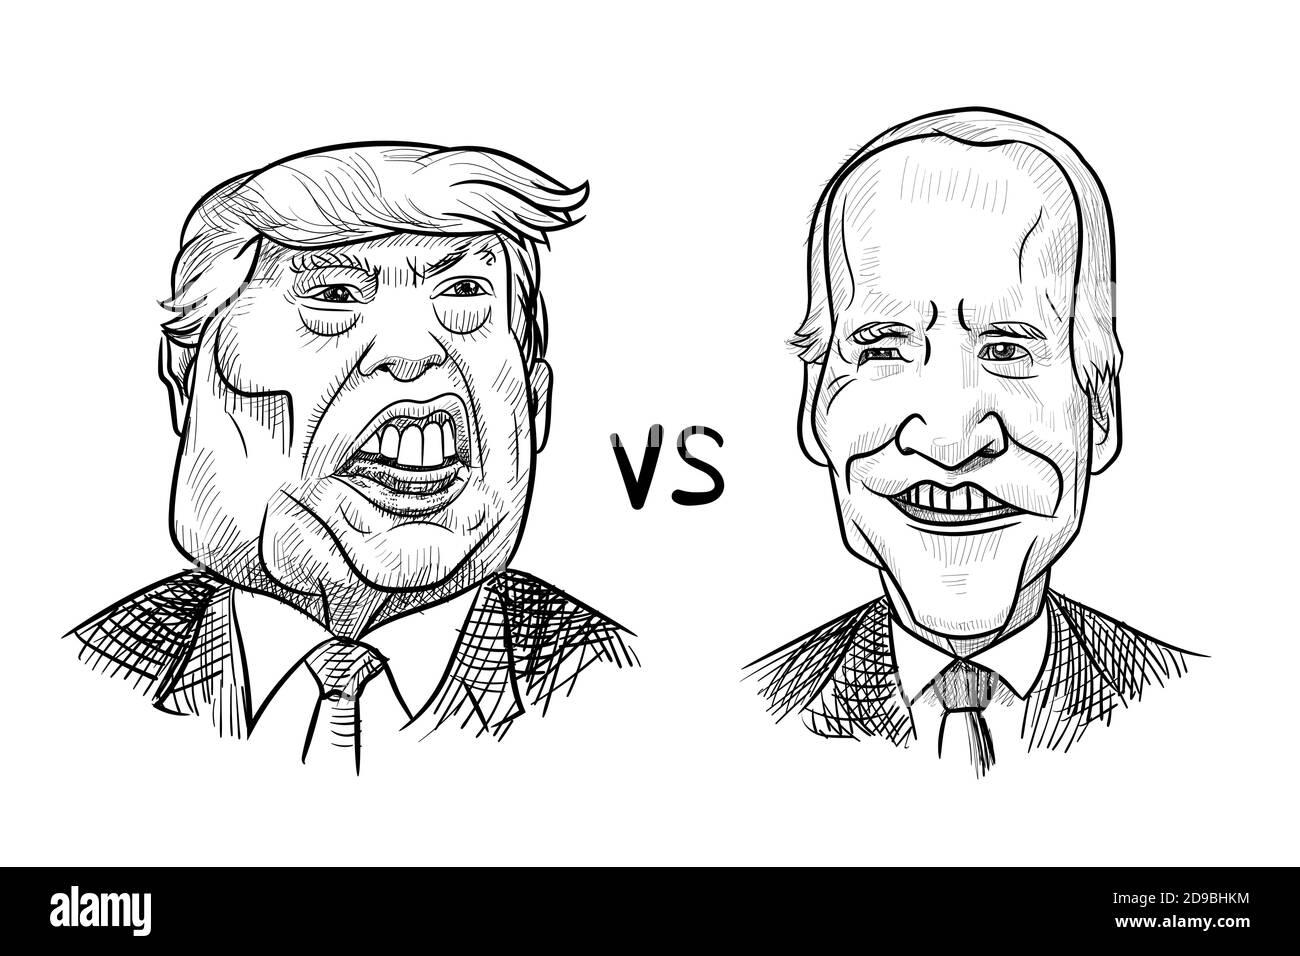 Nov 4, 2020, Bangkok, Thailand: Caricature drawing portrait of Republican Donald Trump vs Democrat Joe Biden for American President Election 2020. Stock Vector